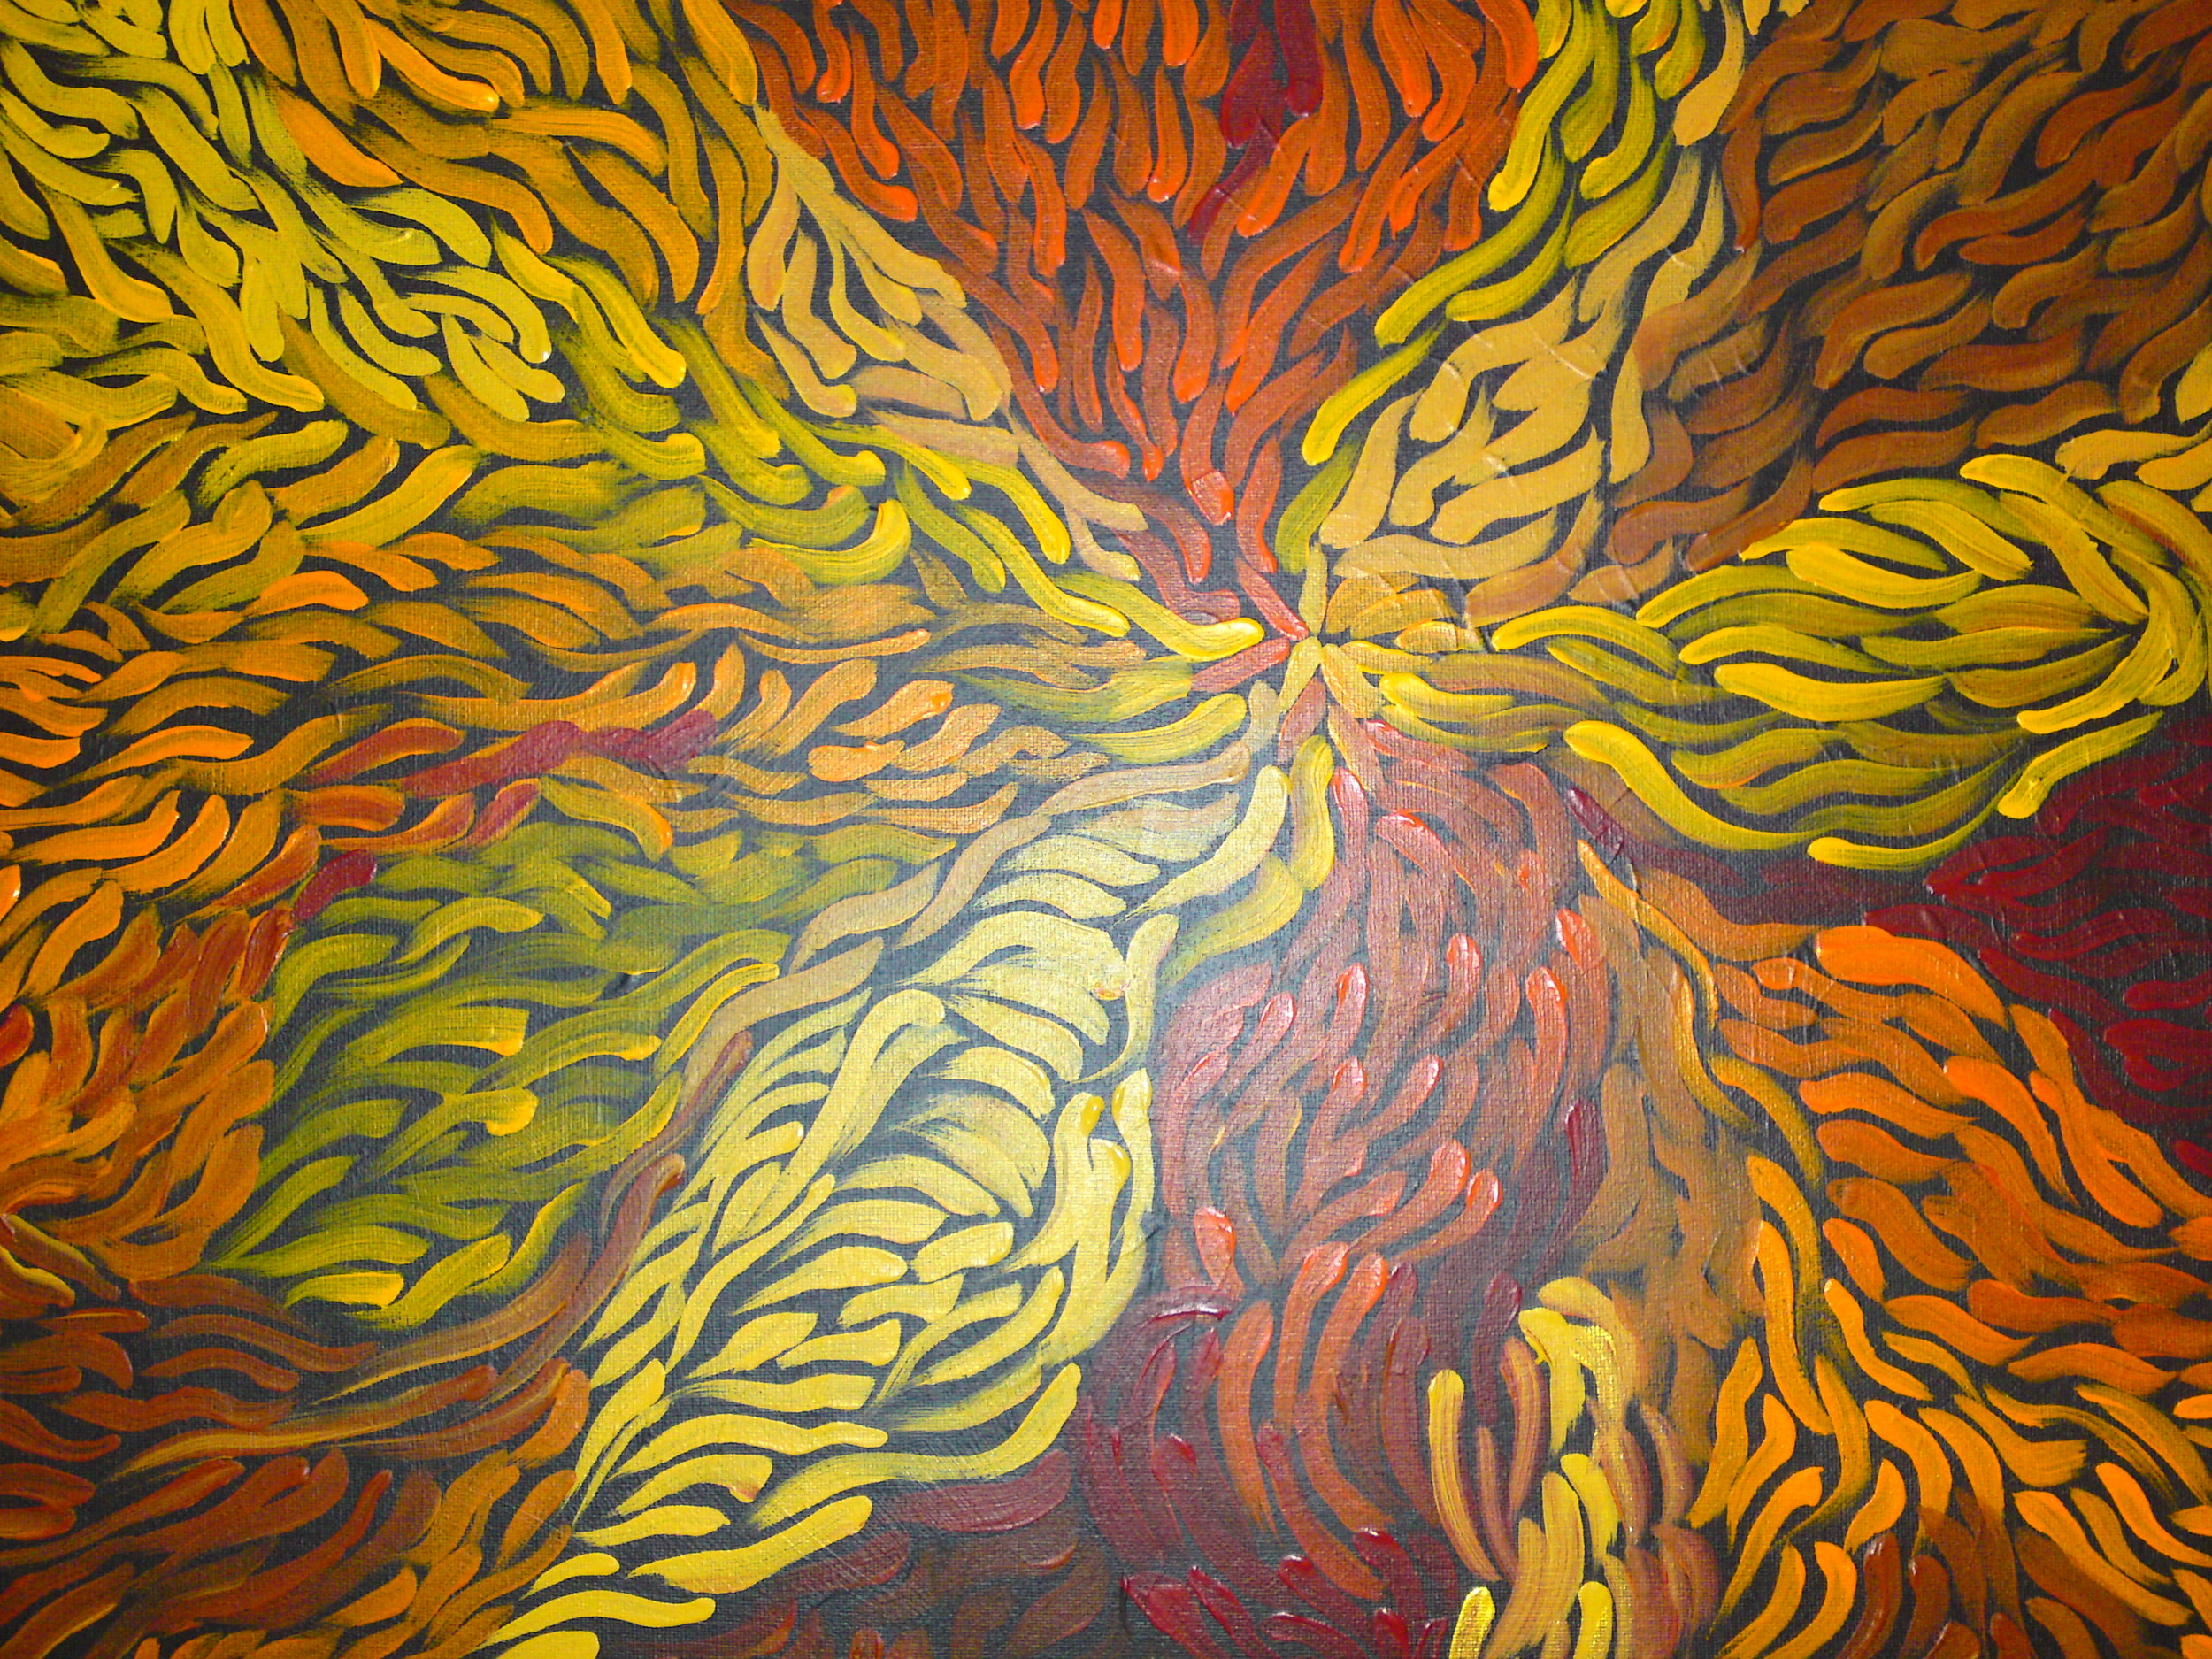 Homage to Aboriginal Art